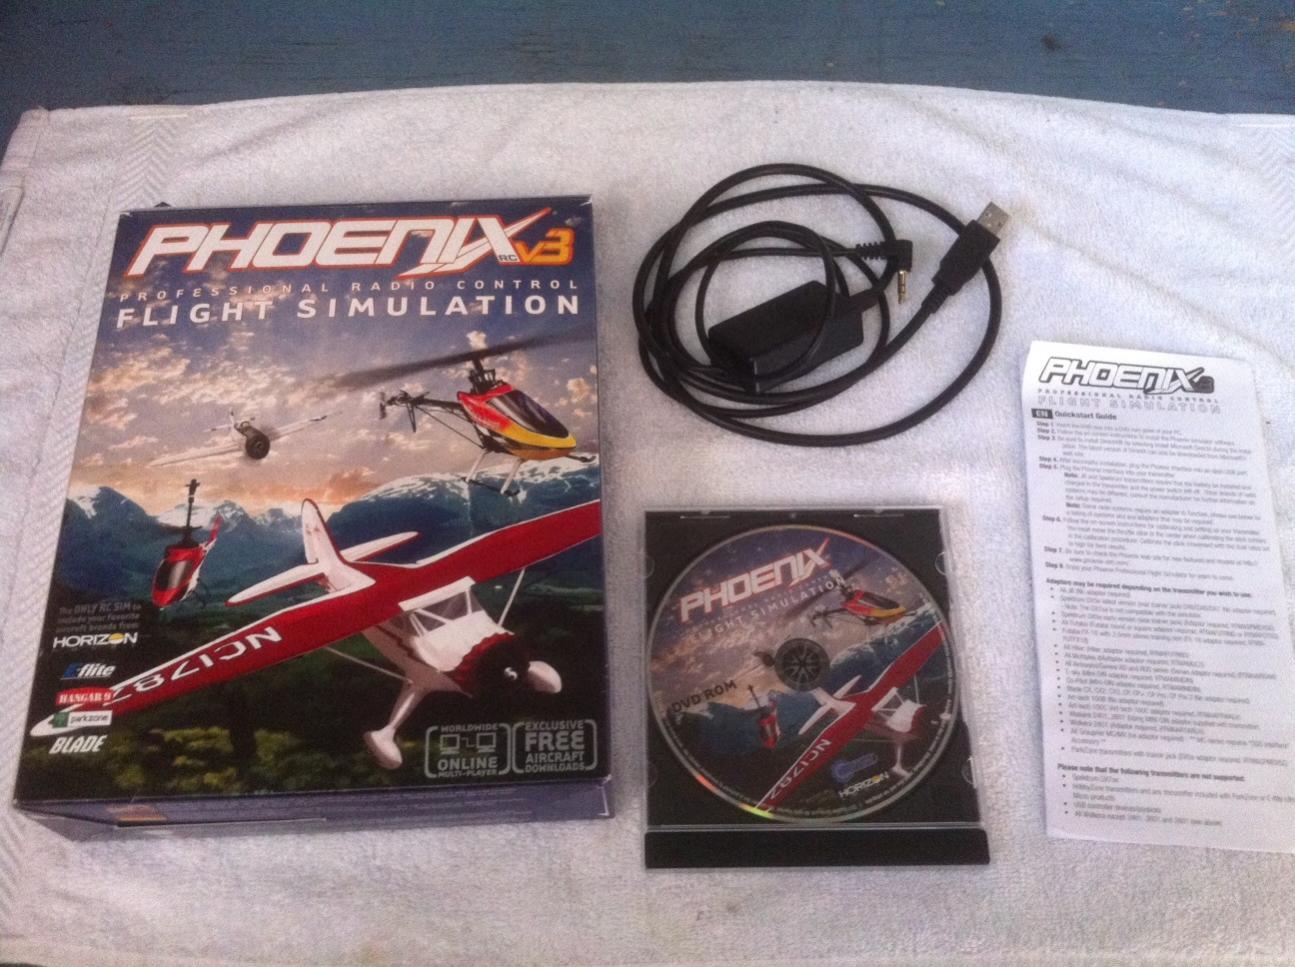 Phoenix flight simulator for sale / Mad greek lawrence ks